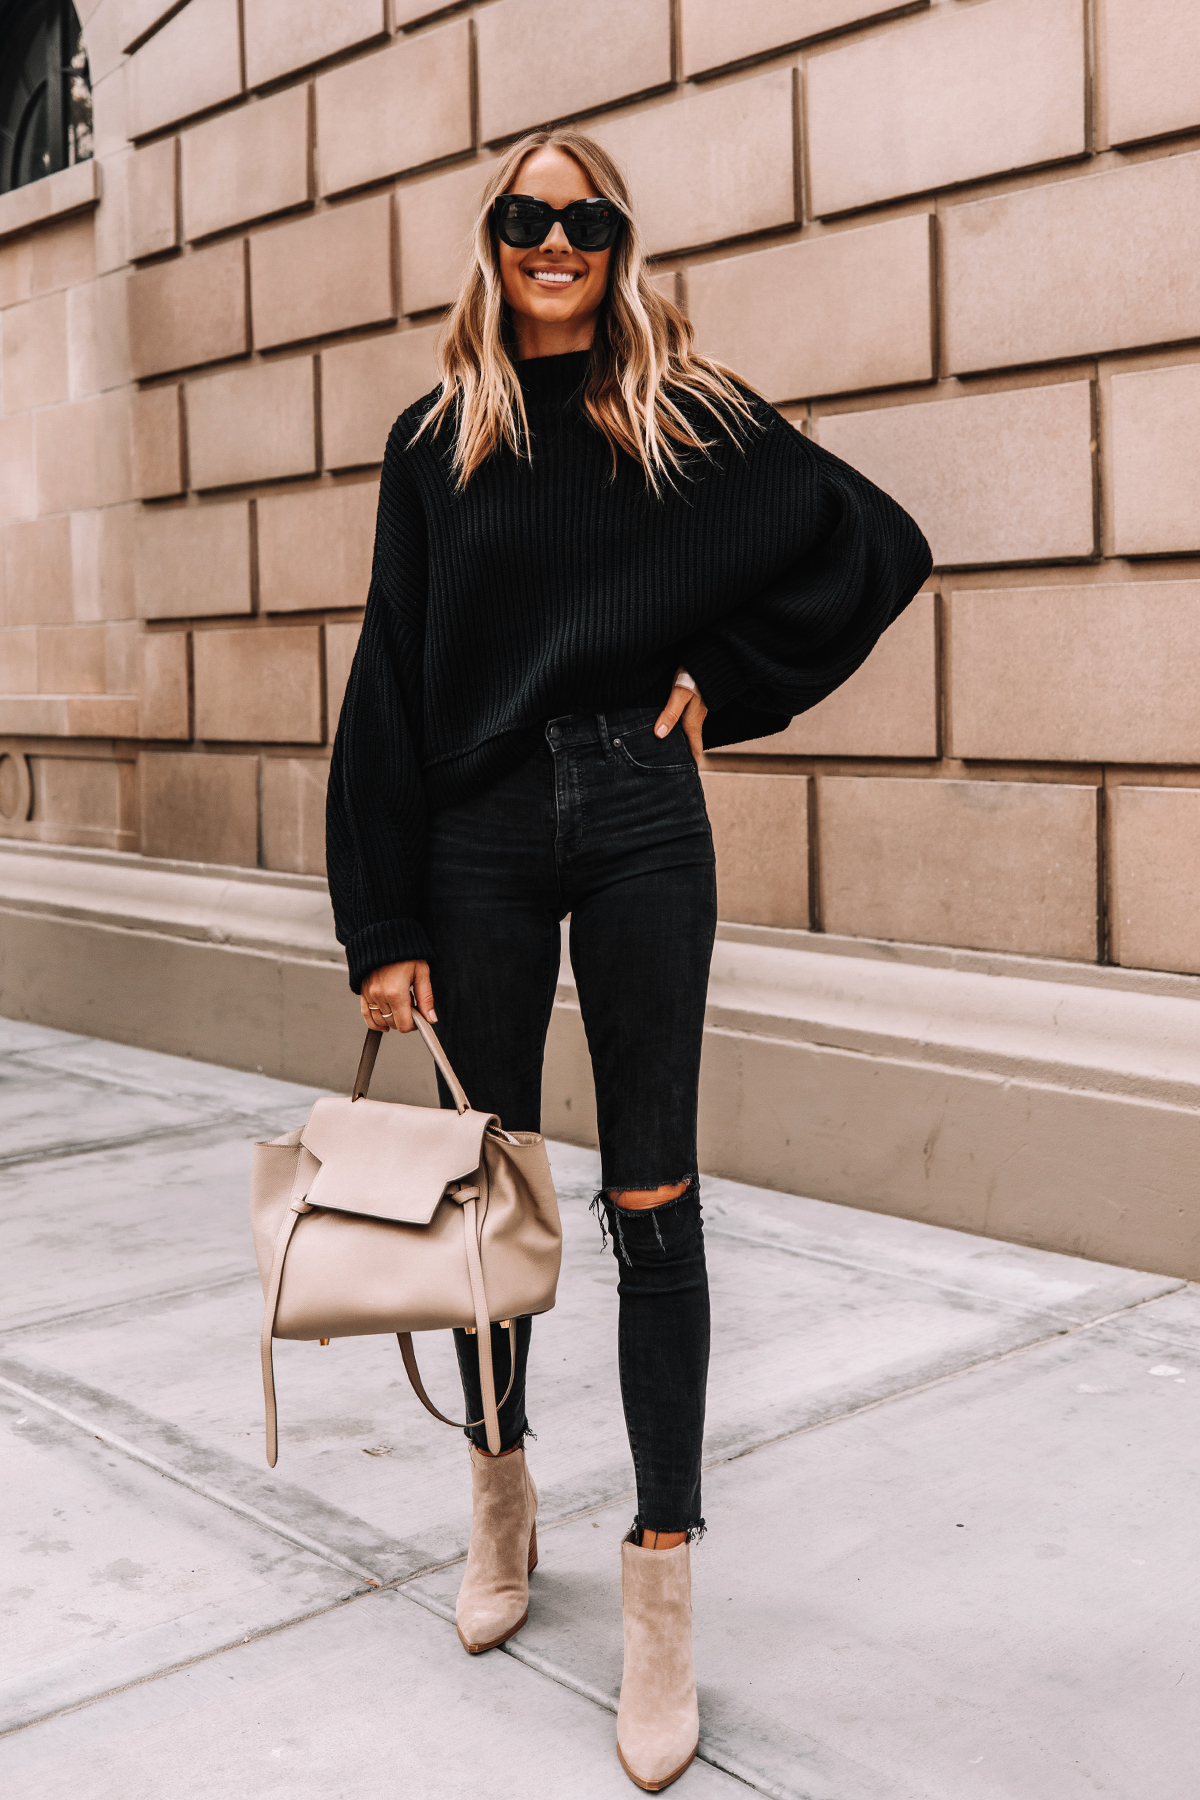 Fashion Jackson Wearing Free People Emmy Black Sweater Madewell Black Skinny Jeans Marc Fisher Oshay Cloud Suede Booties Celine Belt Bag